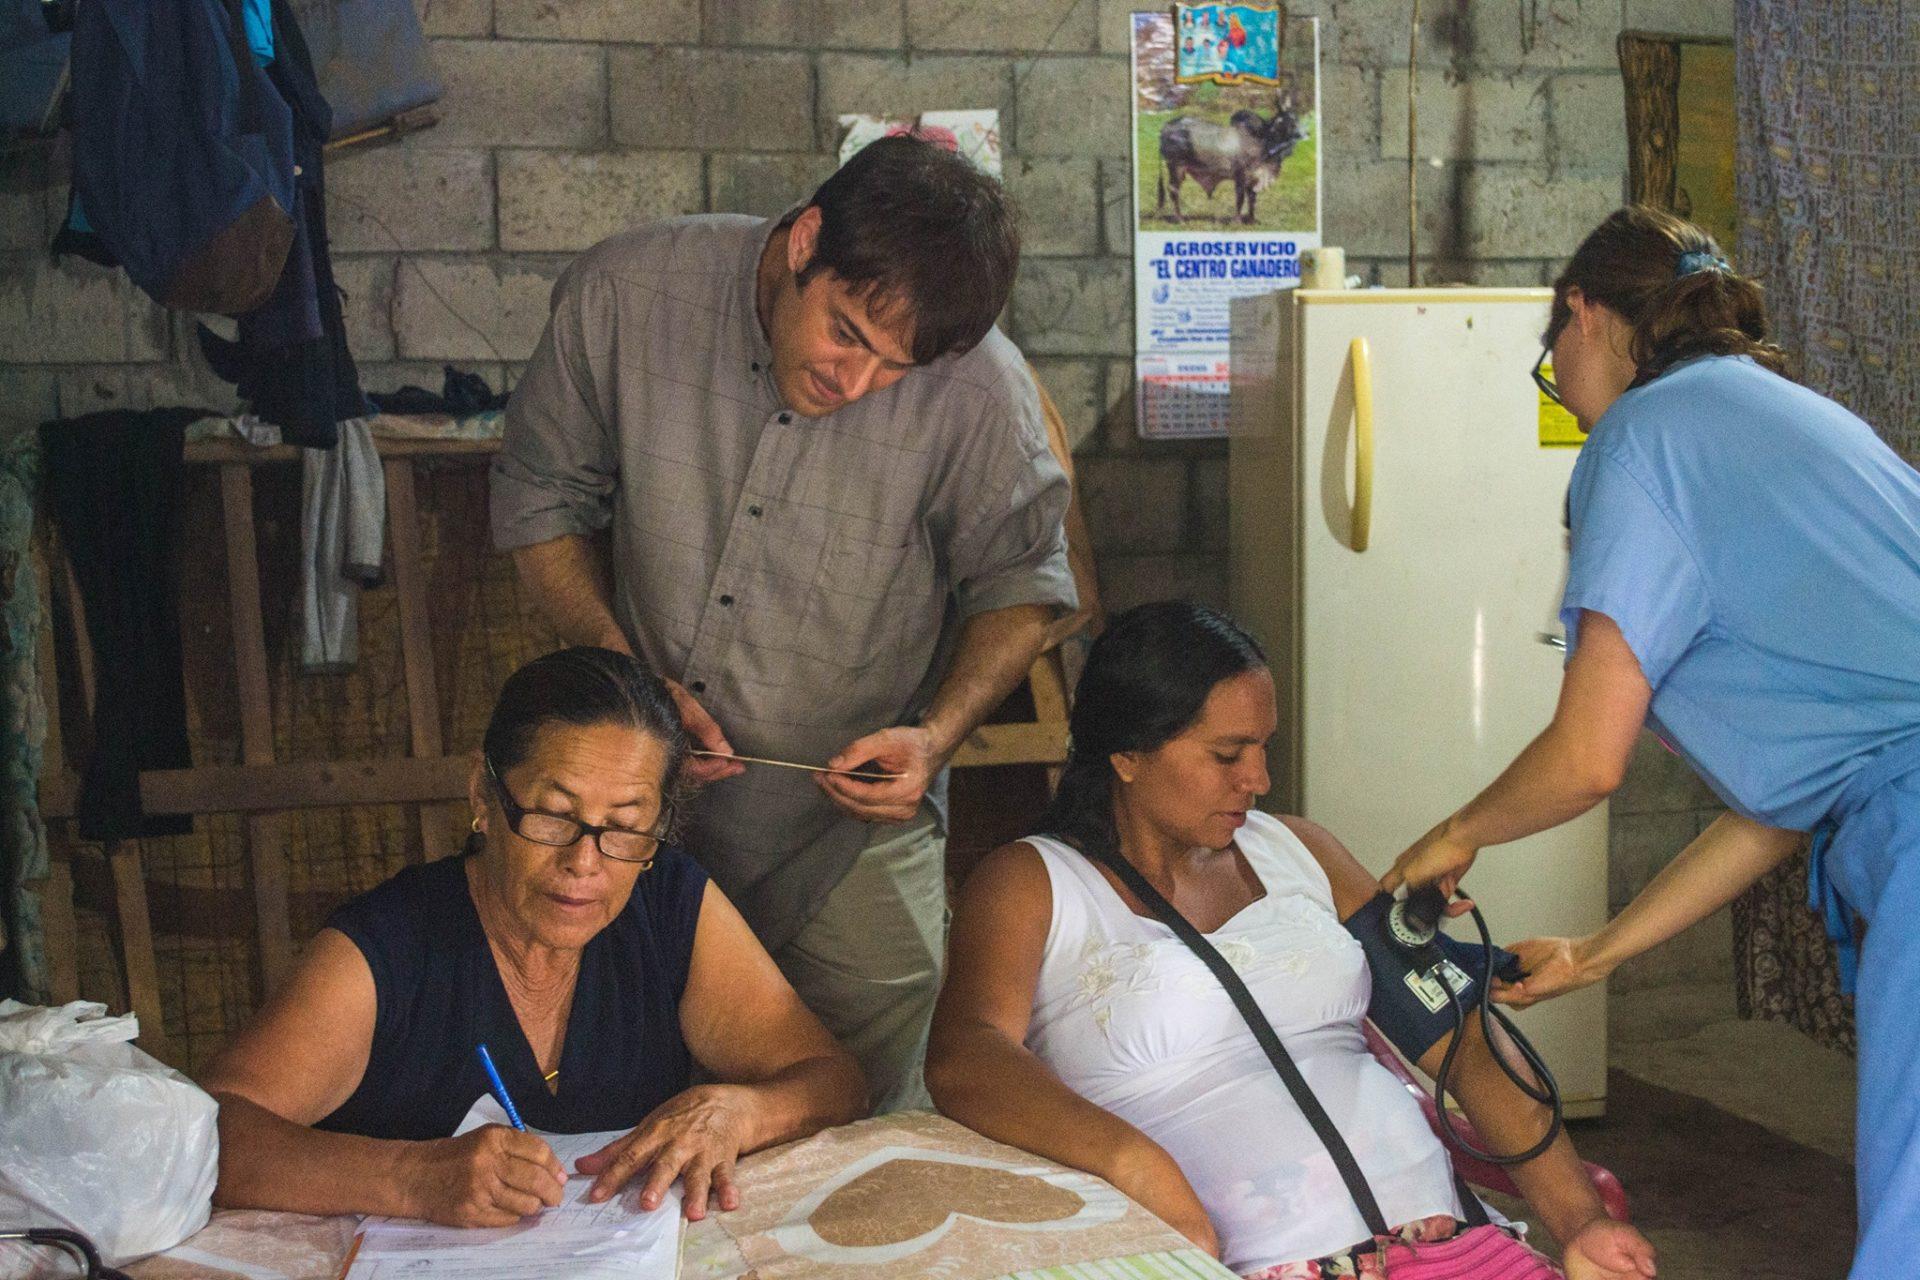 Suchitoto Midwives Association work alongside IU students of Medicine in communities of El Salvador